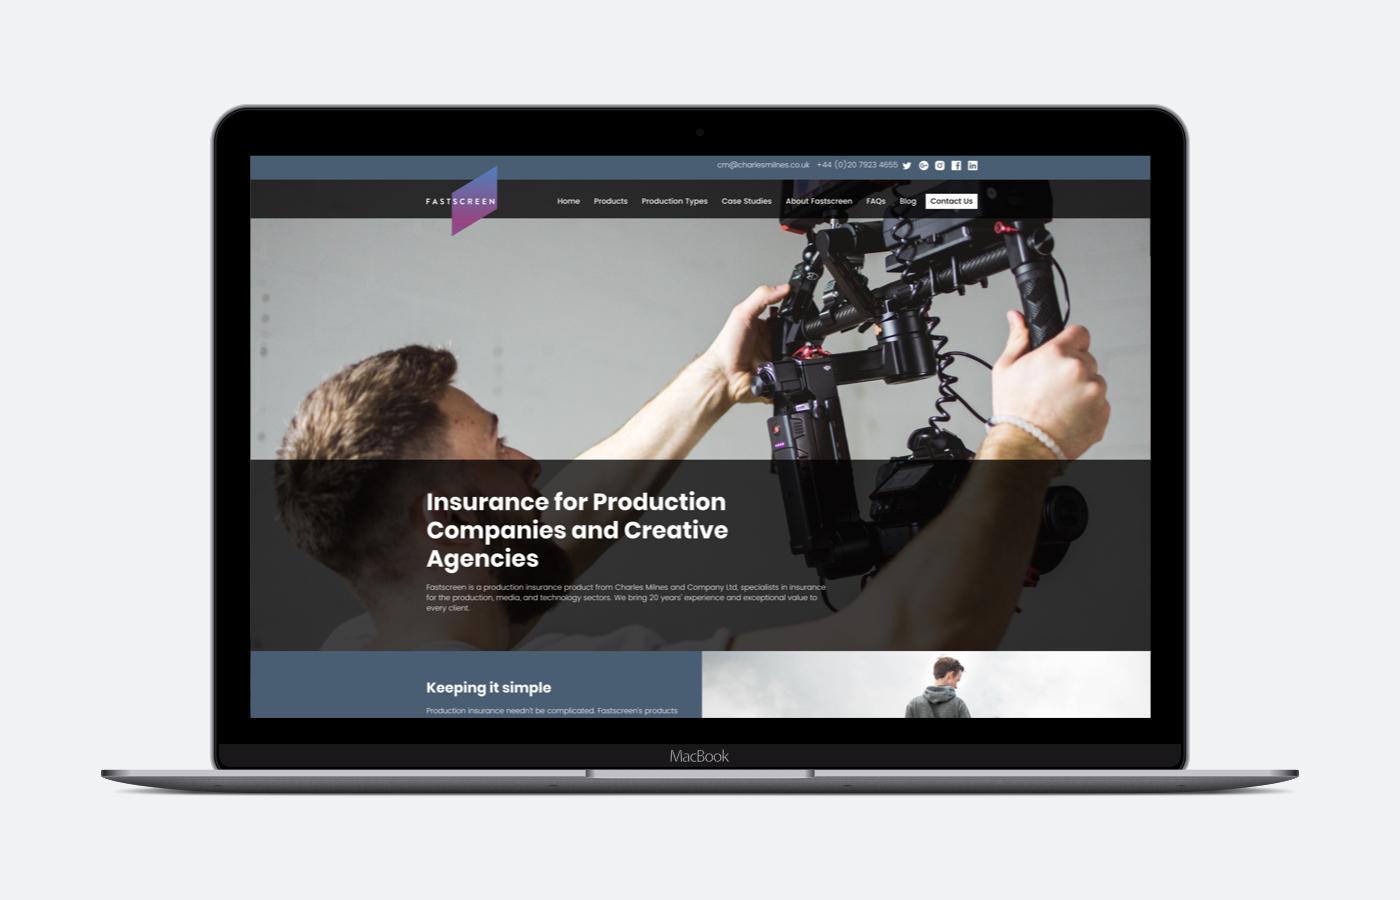 Fastscreen's website goes live